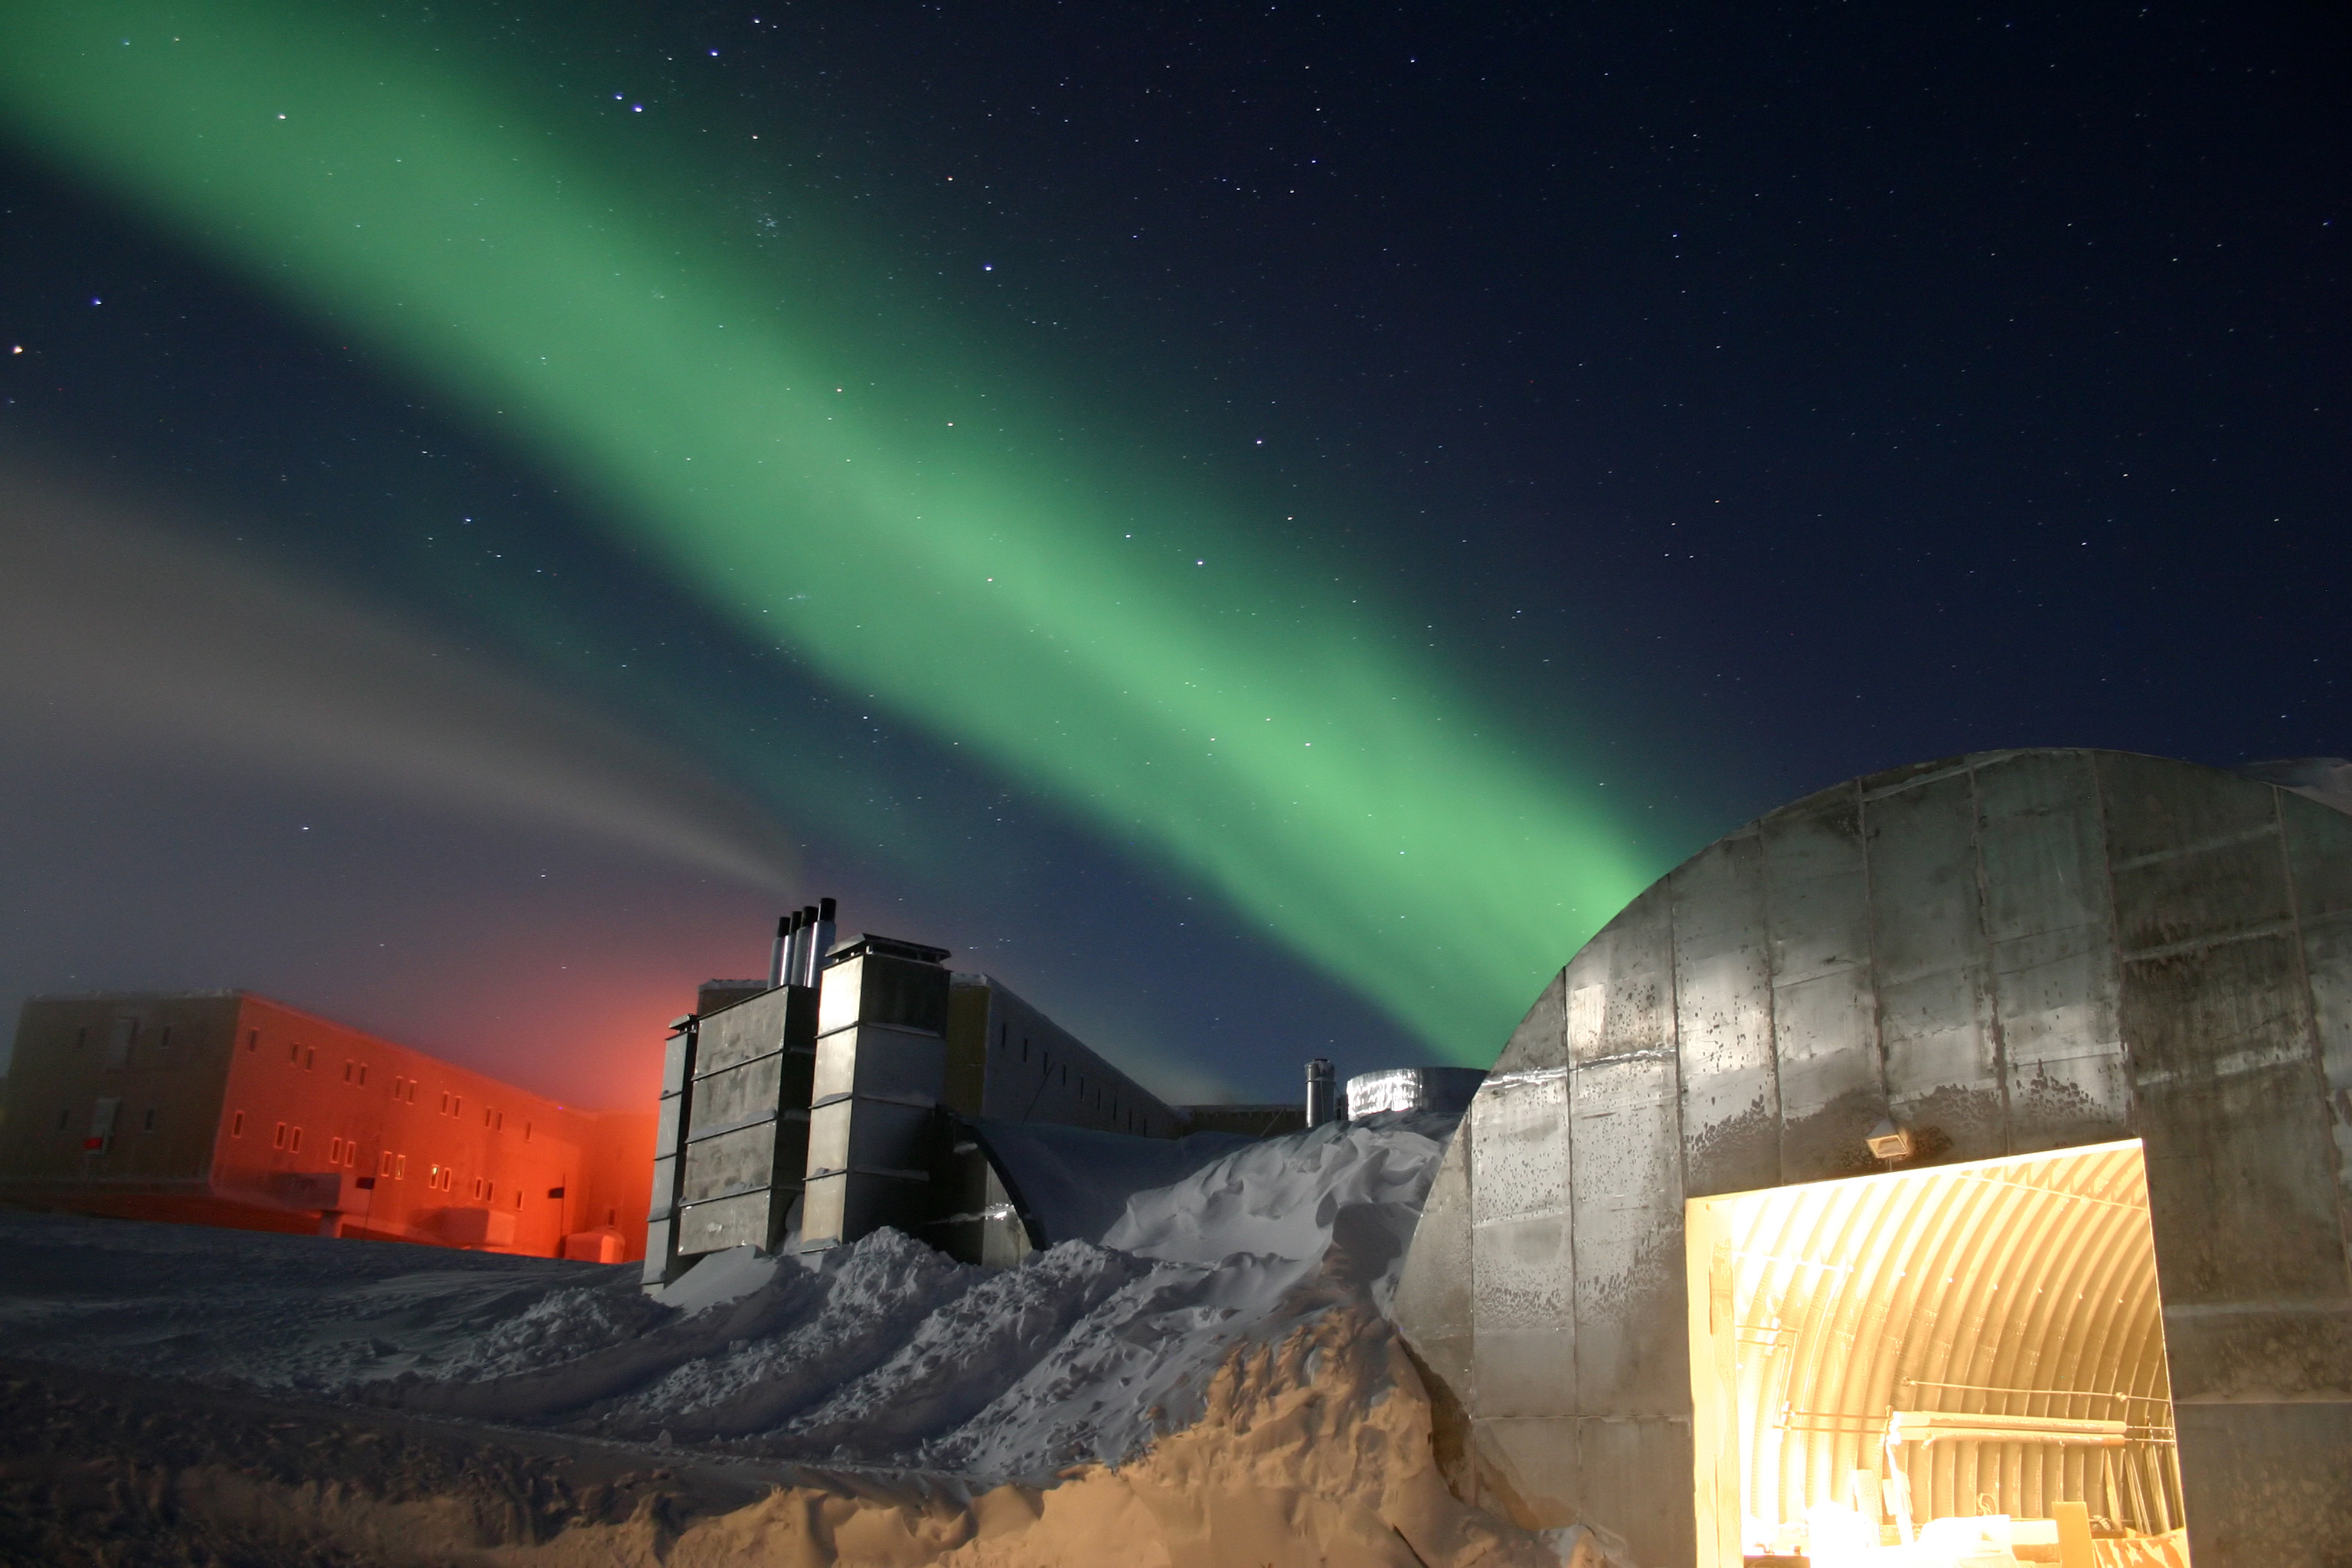 http://upload.wikimedia.org/wikipedia/commons/7/7a/Amundsen-Scott_marsstation_ray_h_edit.jpg